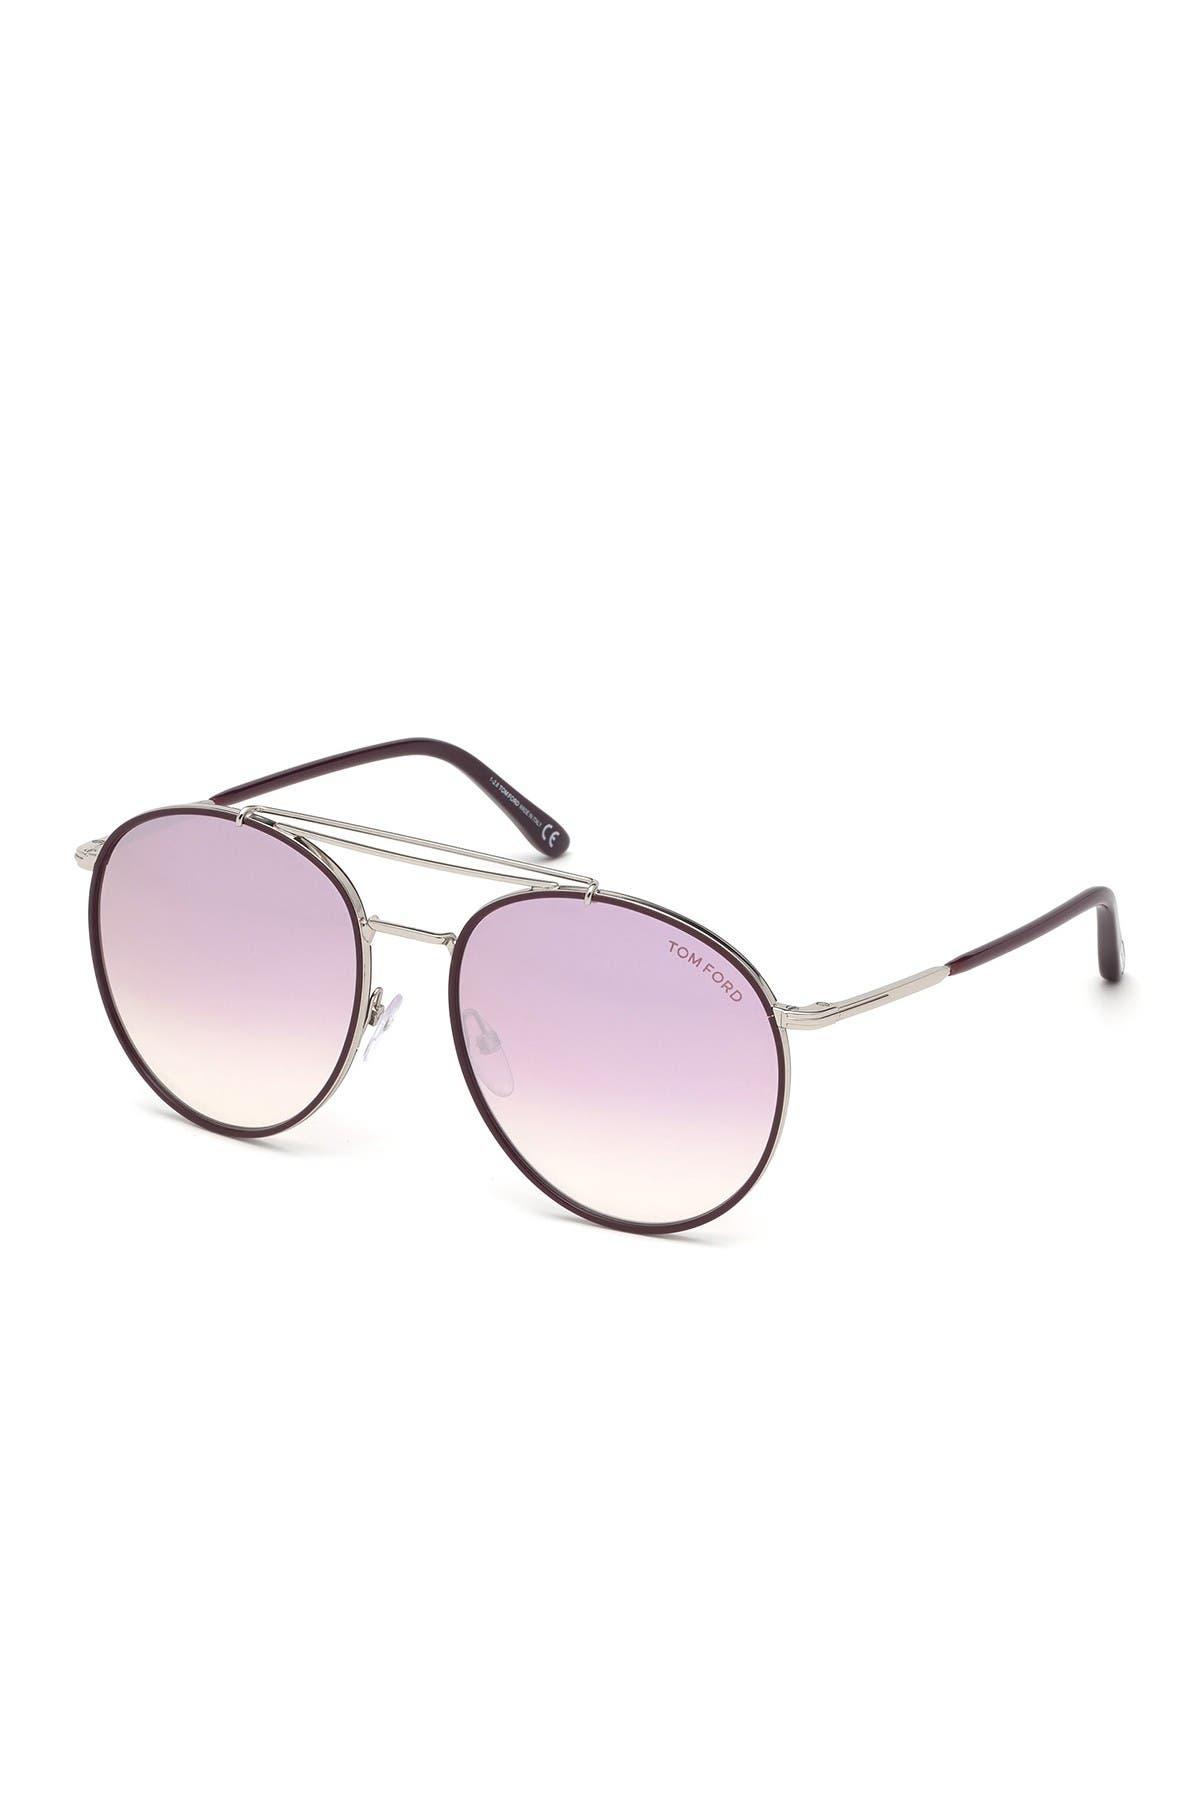 Image of Tom Ford Wesley 59mm Aviator Sunglasses